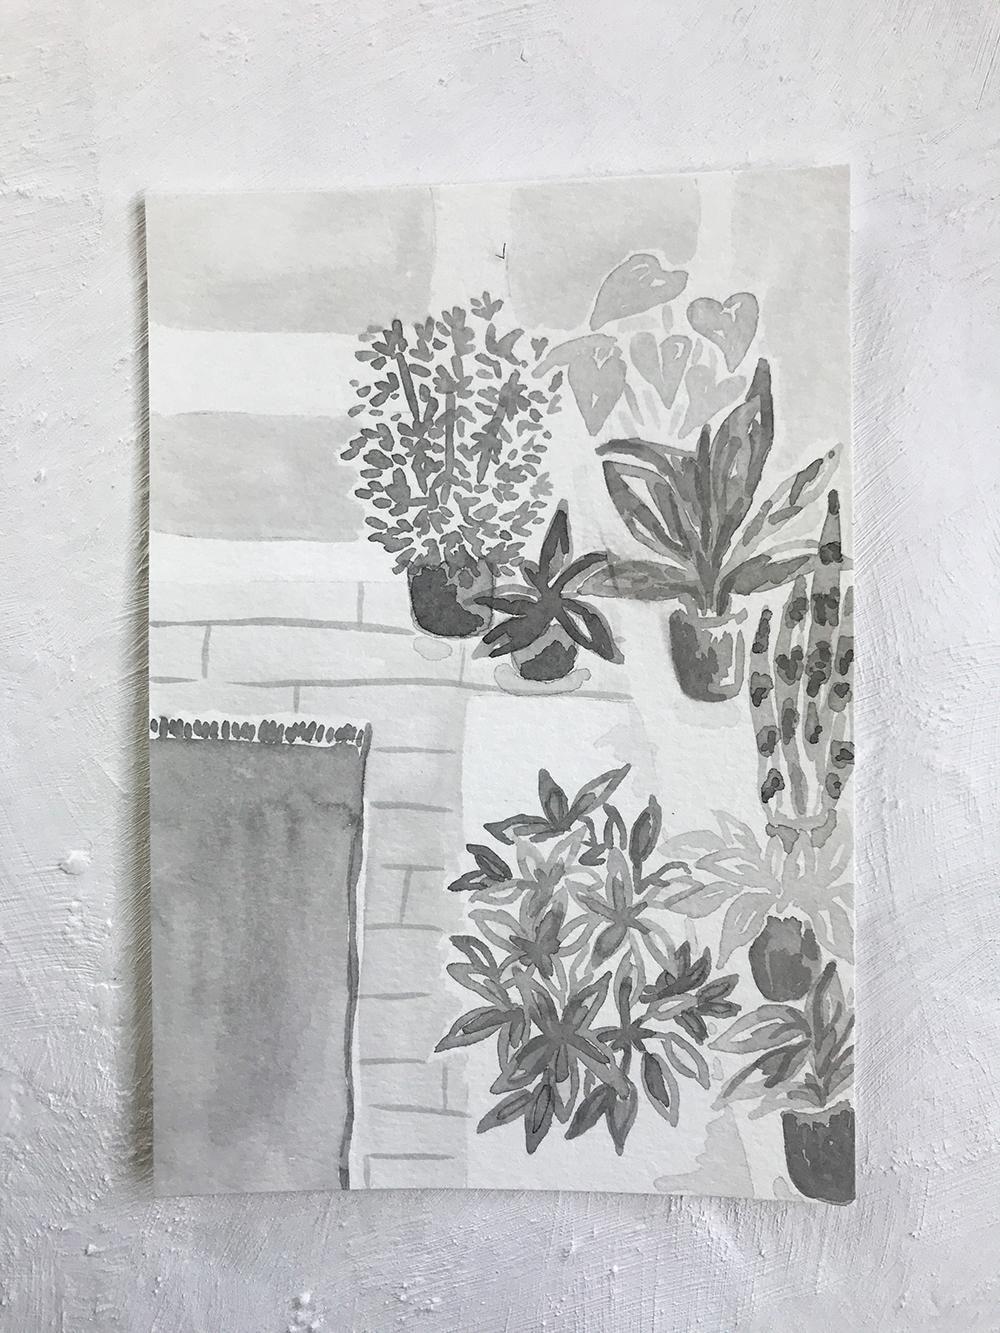 Birmingham Plant Stores - image 4 - student project